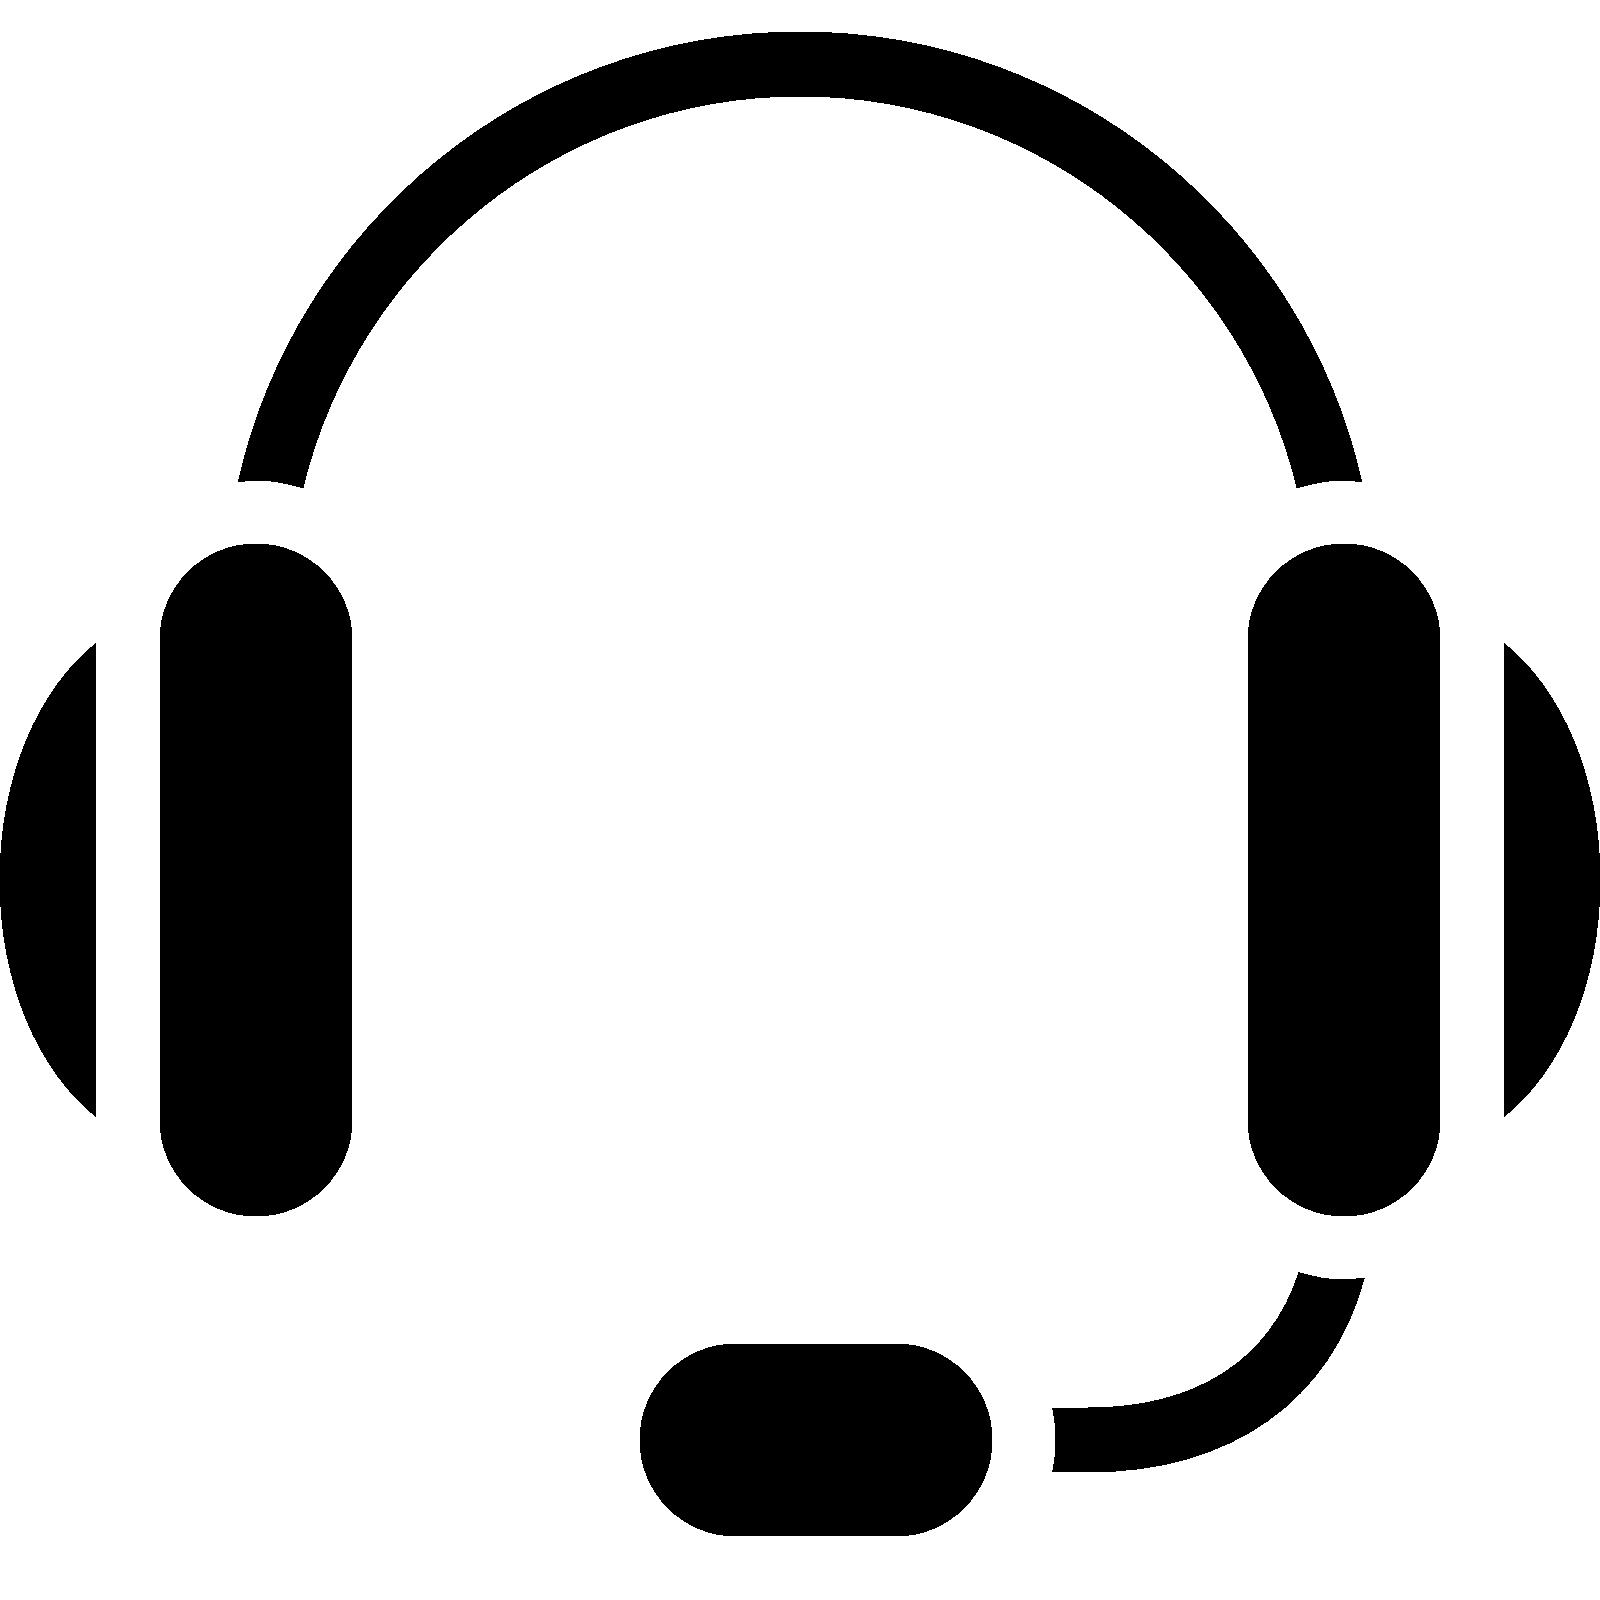 Headphones clipart gaming.